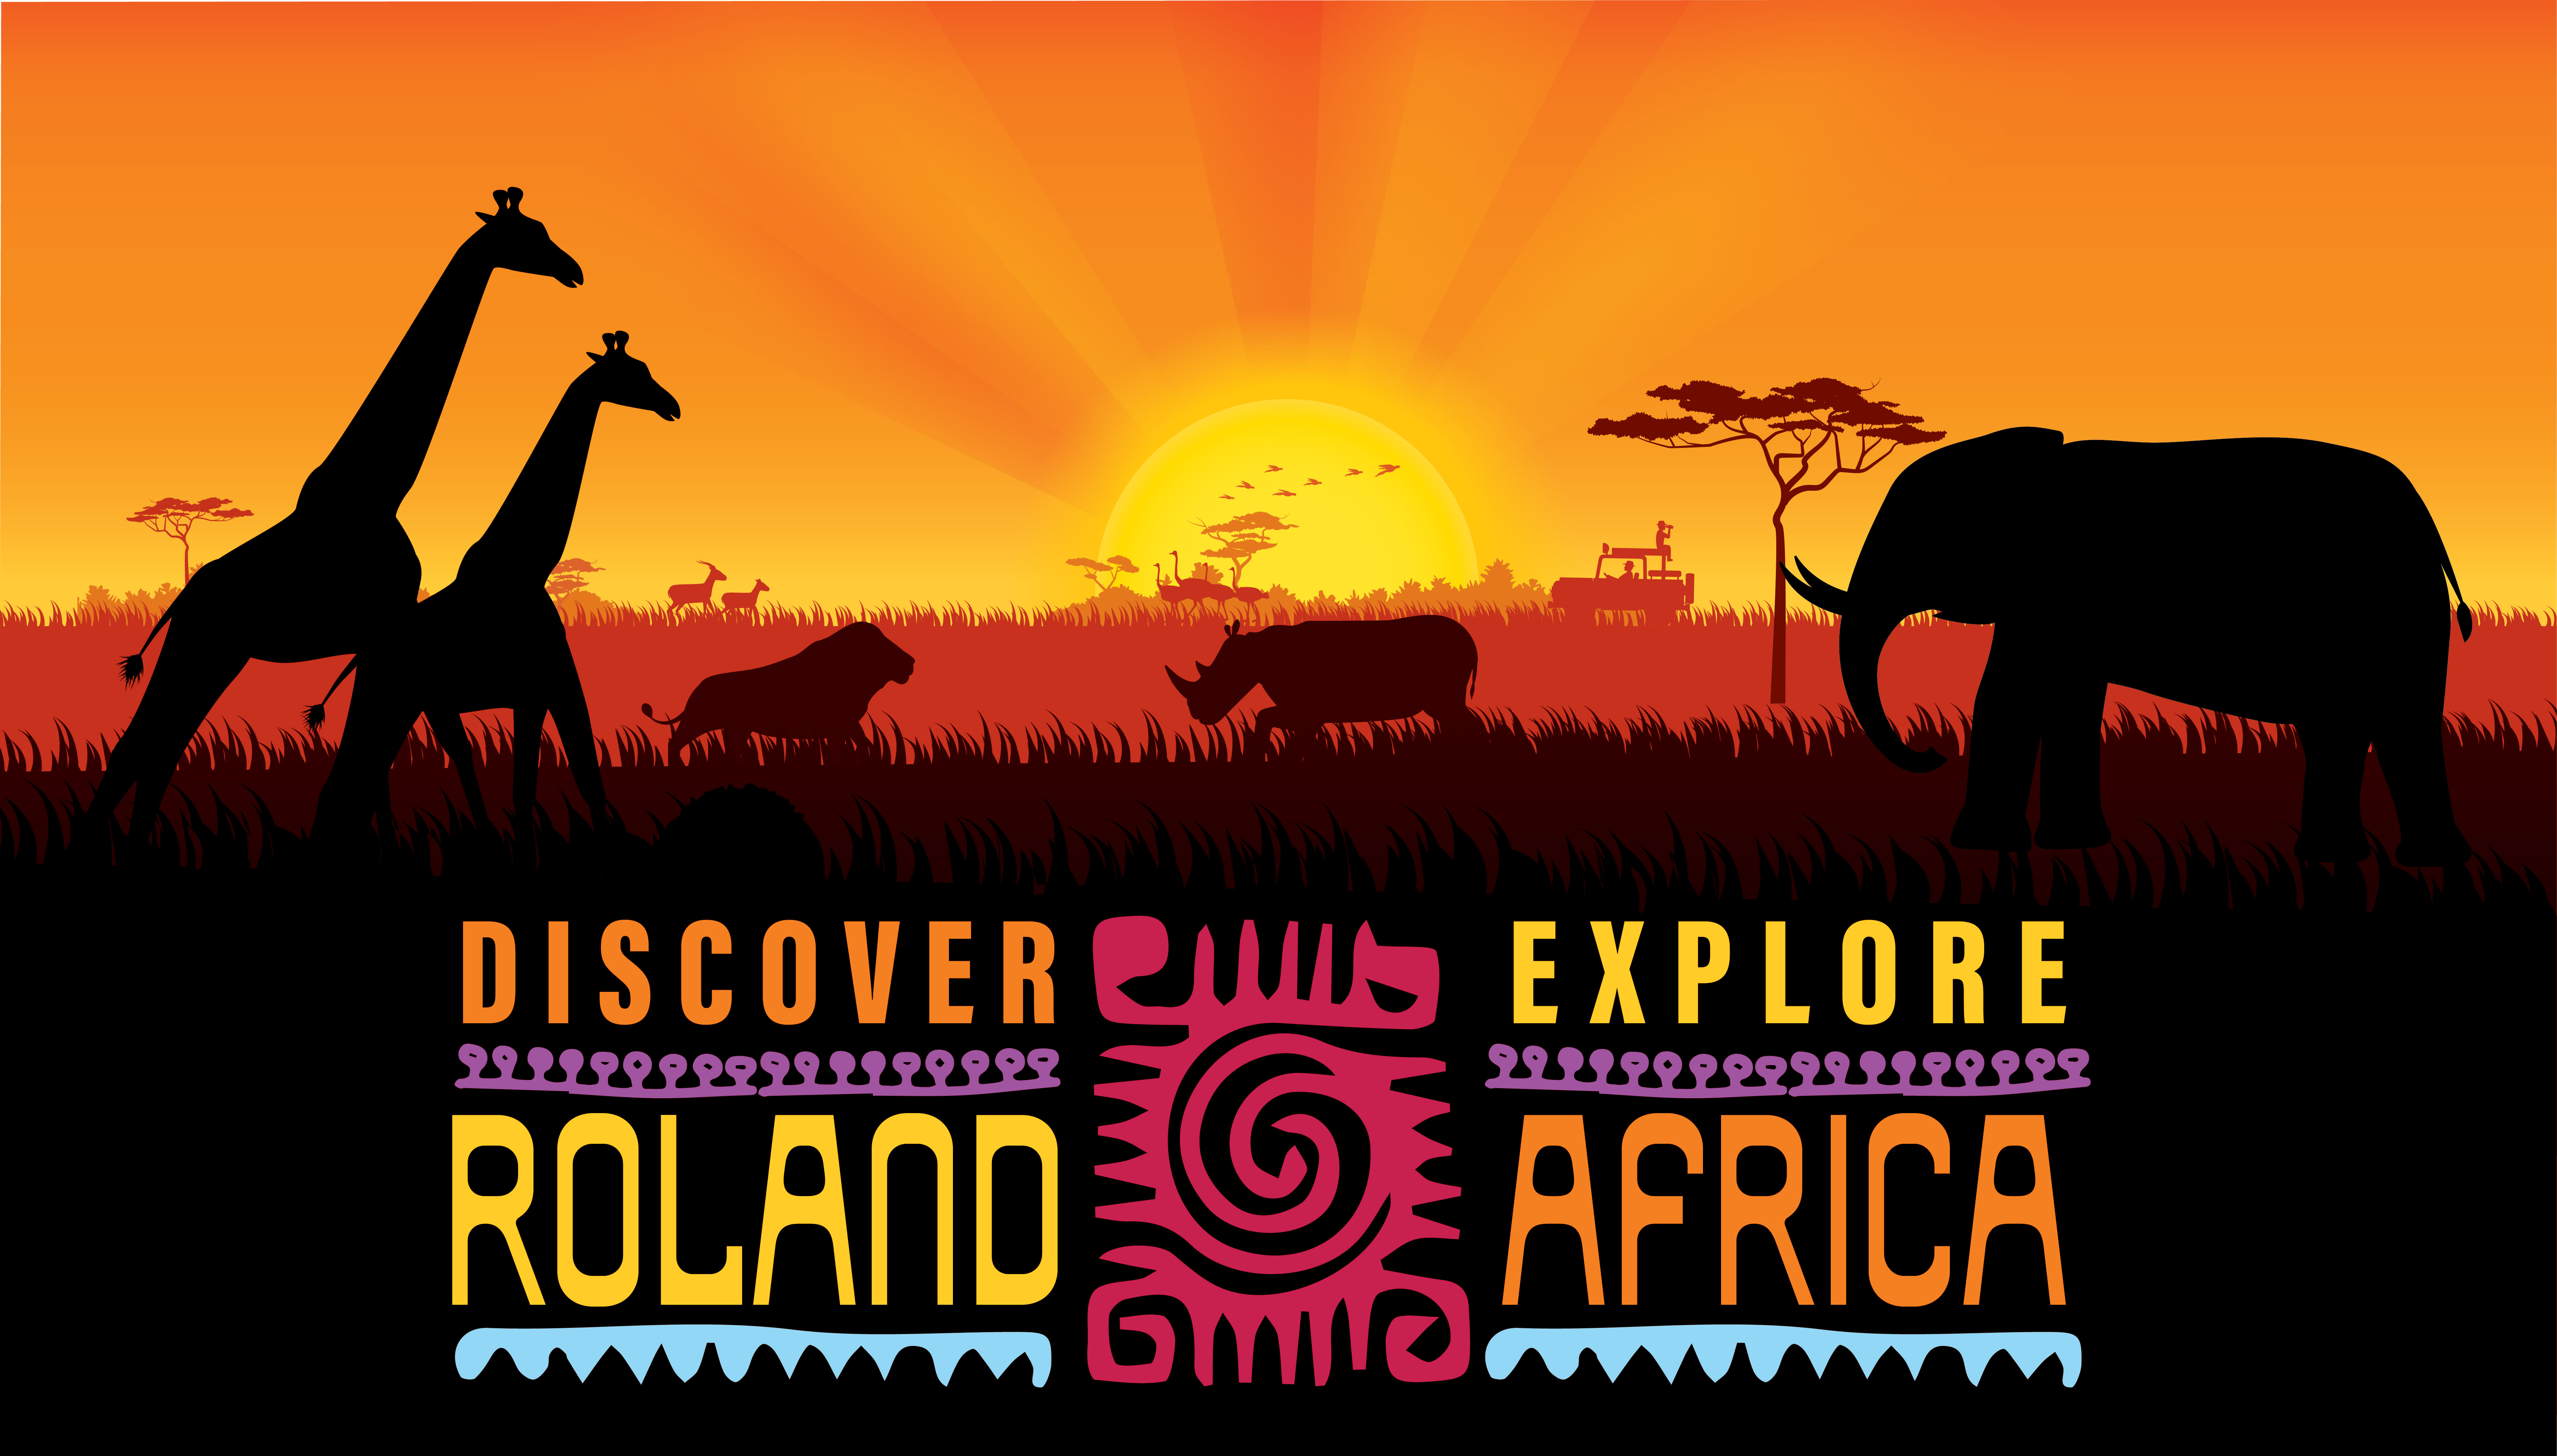 Discover Roland, explore Africa!